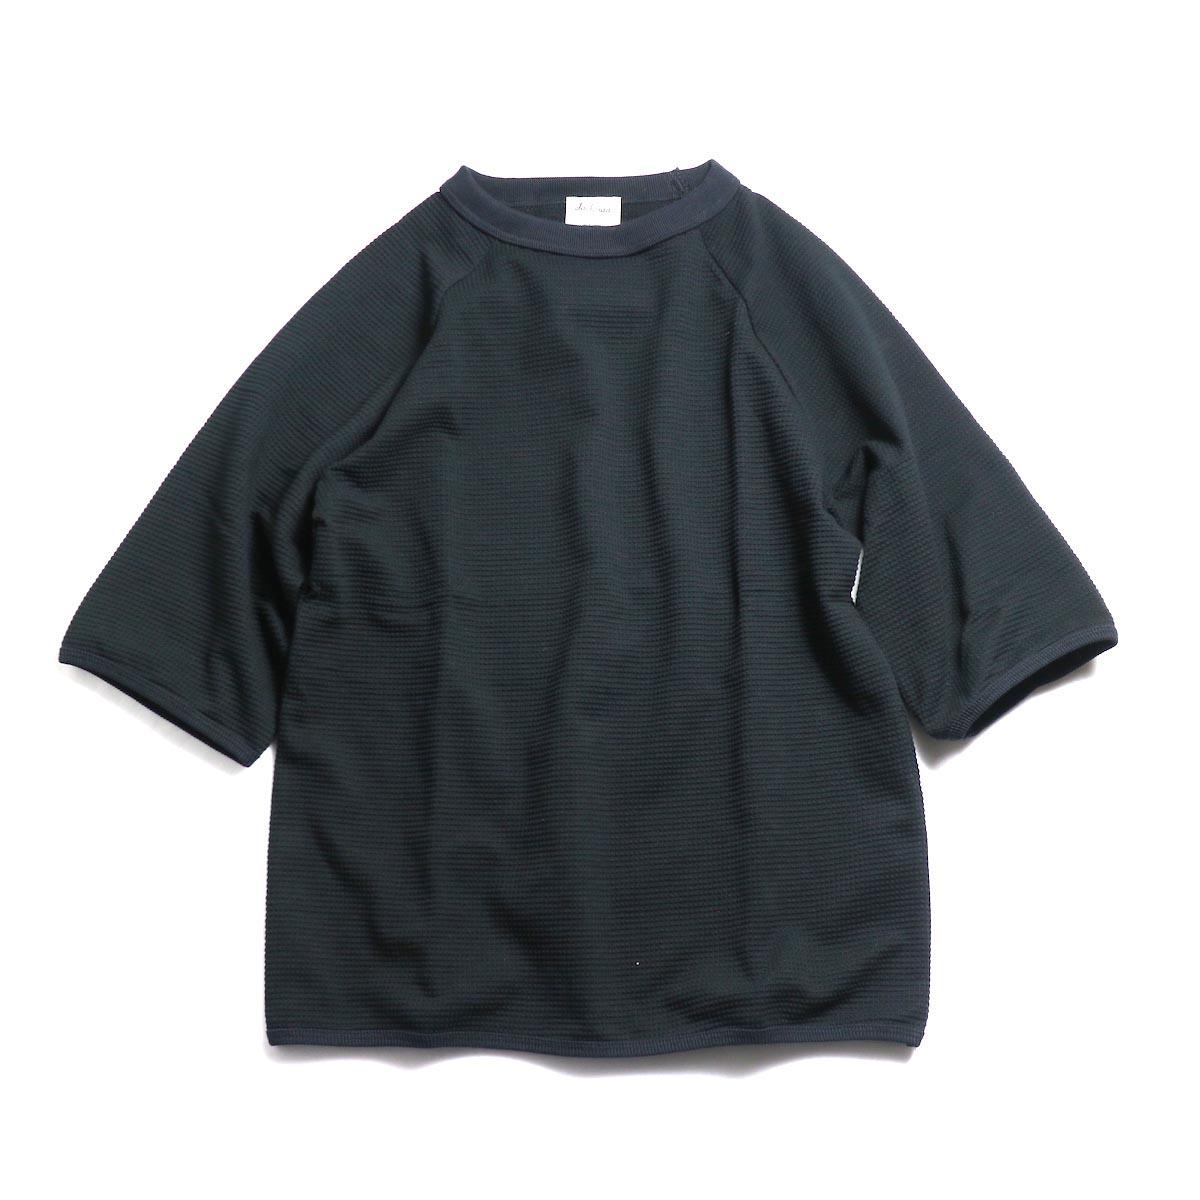 Jackman / 1/2 Sleeved T-Shirt -Black